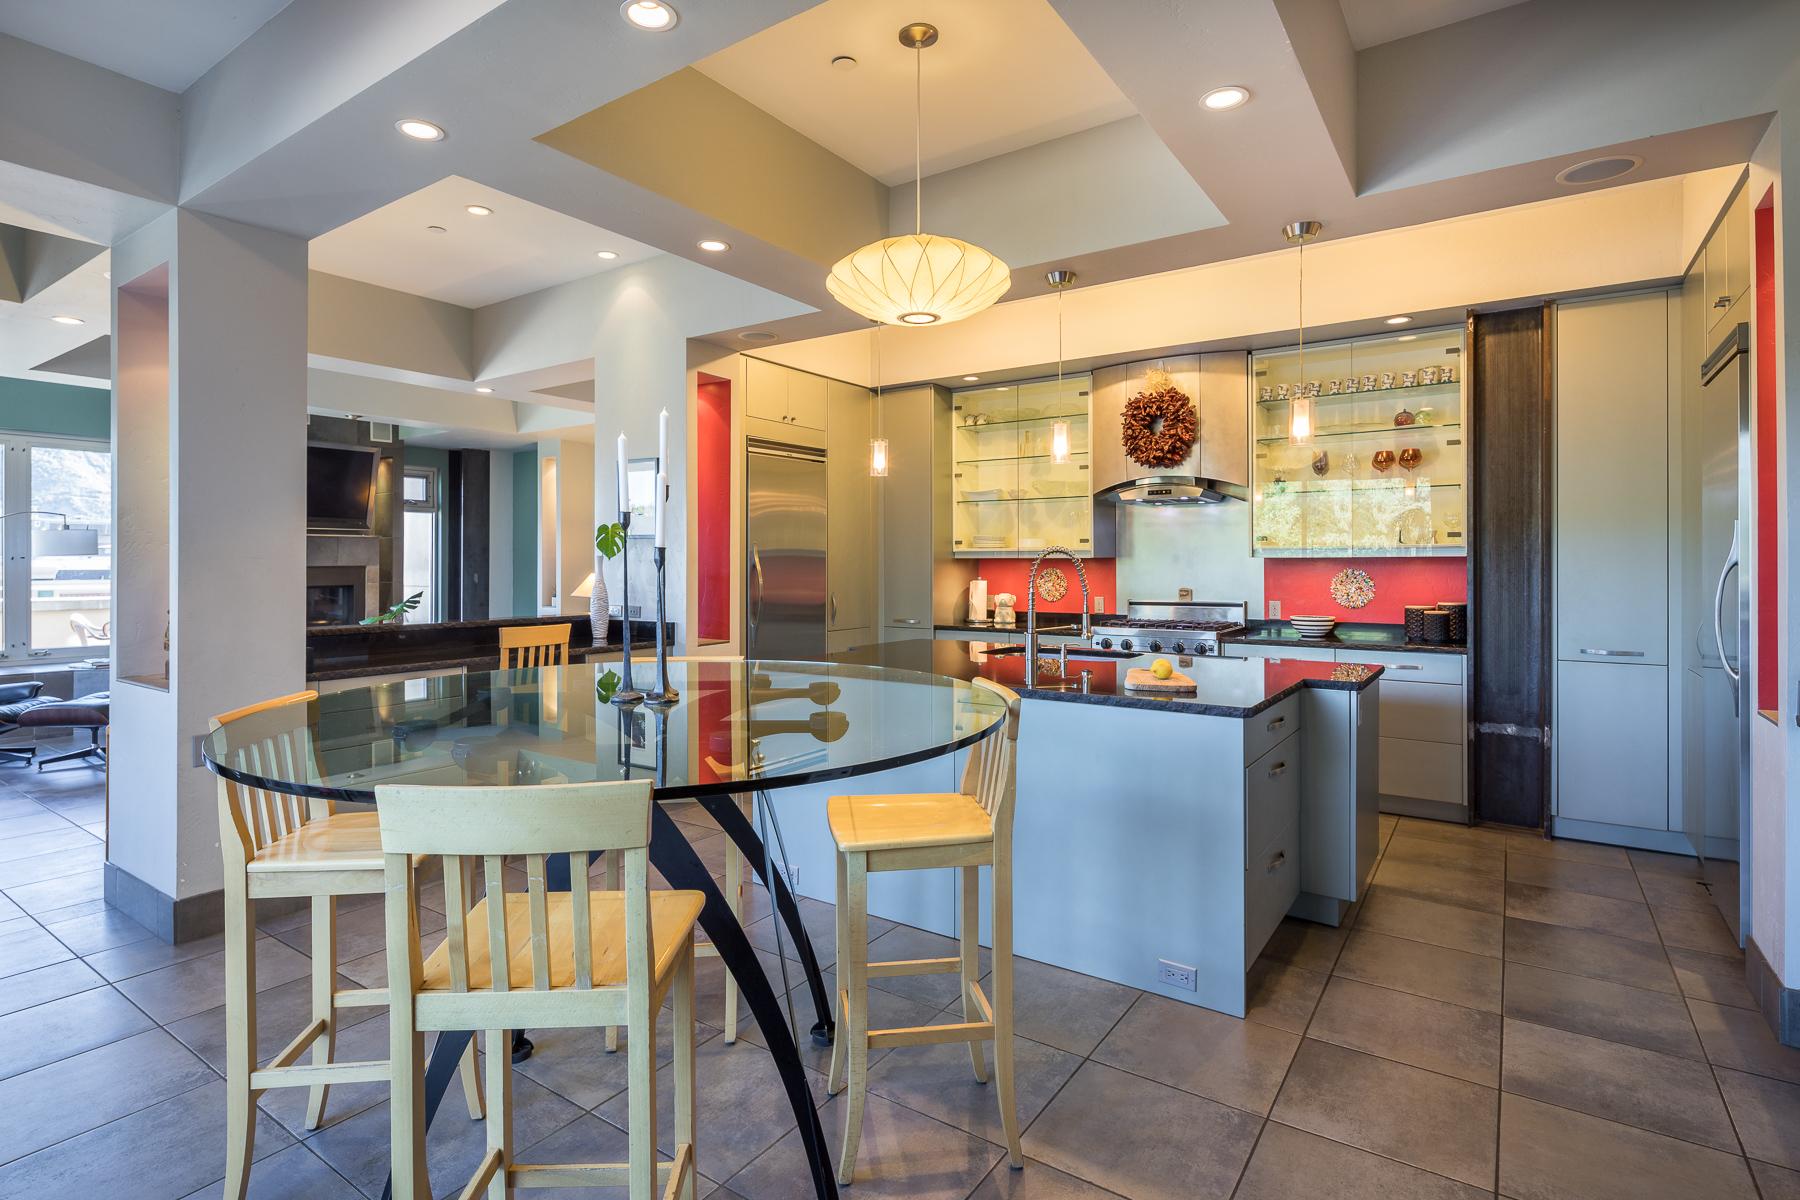 Additional photo for property listing at 1201 Main Avenue #301 1201 Main Avenue #301 Durango, Colorado 81301 United States